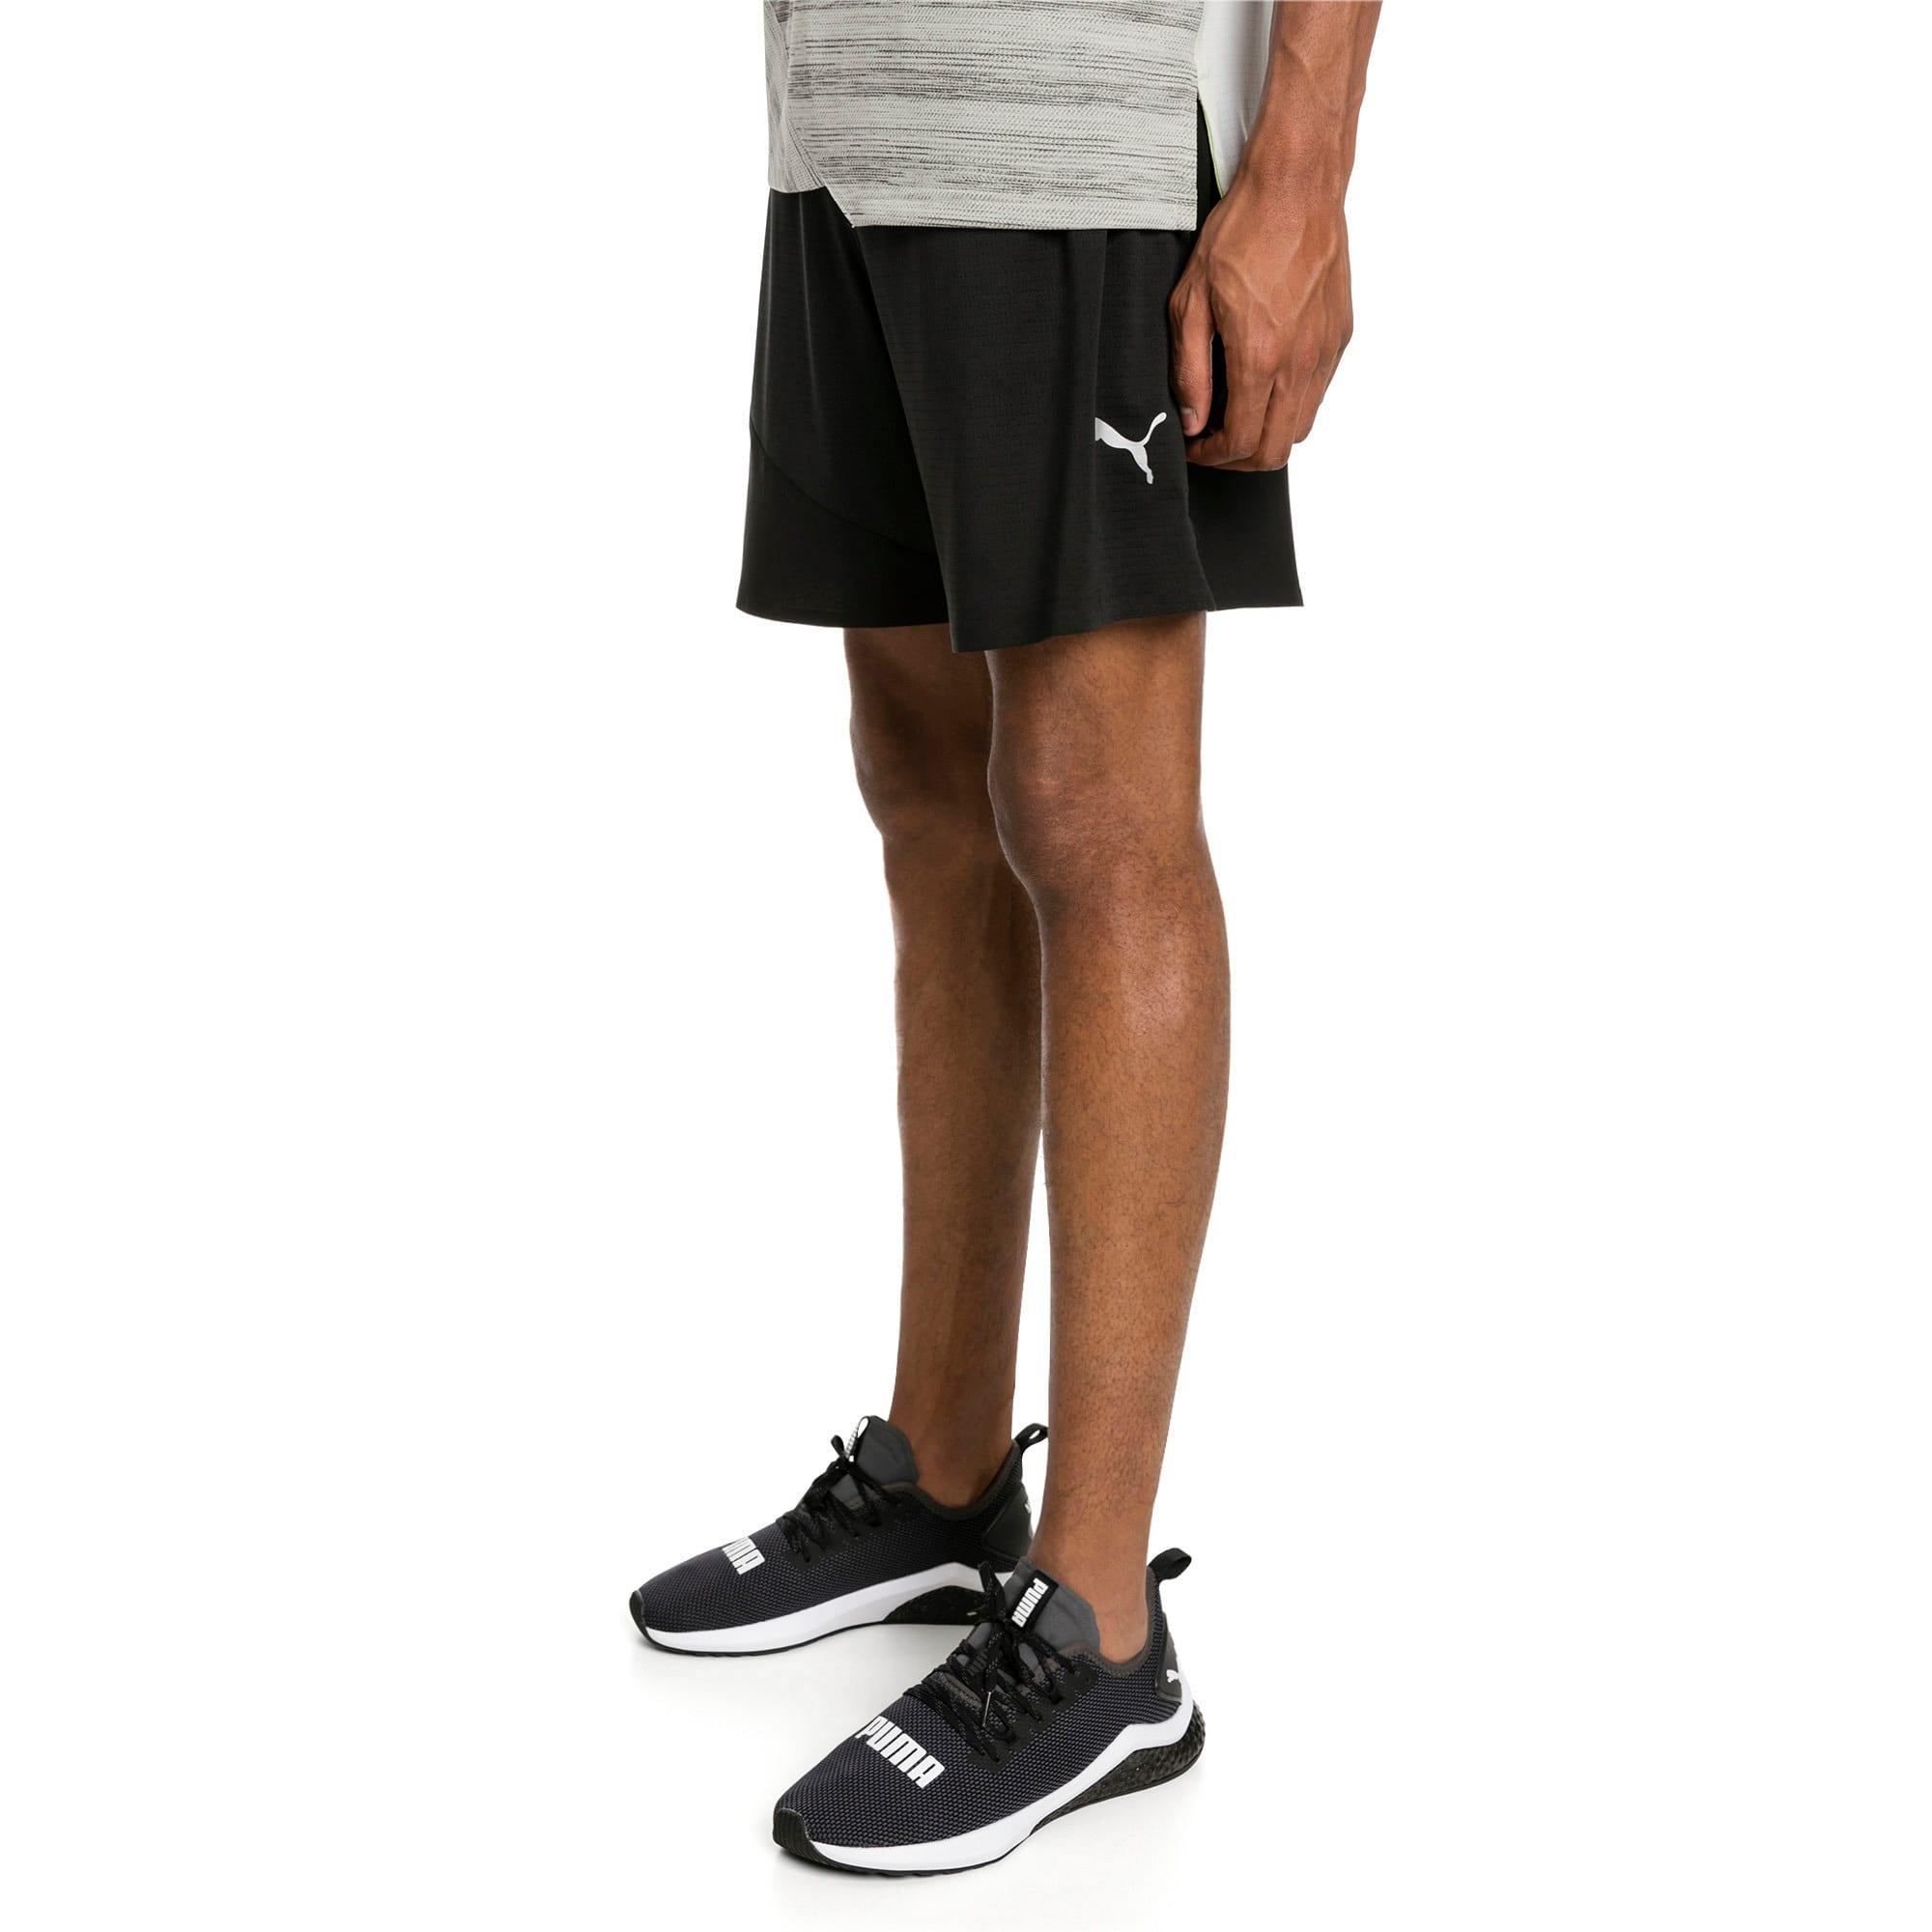 Thumbnail 1 of PACE Breeze Men's Shorts, Puma Black, medium